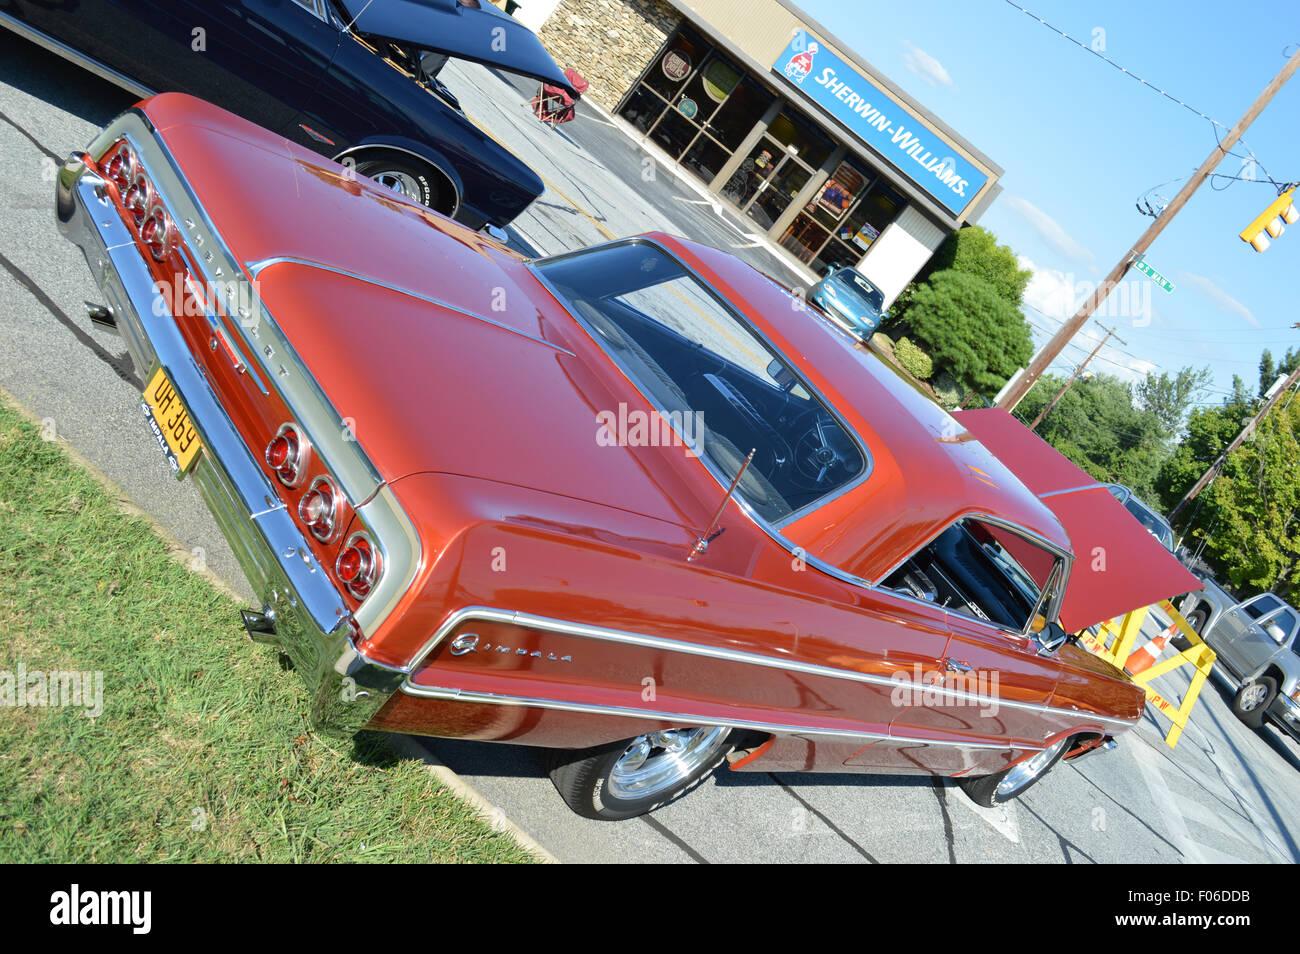 A 1964 Chevrolet Impala Hard Top car. - Stock Image